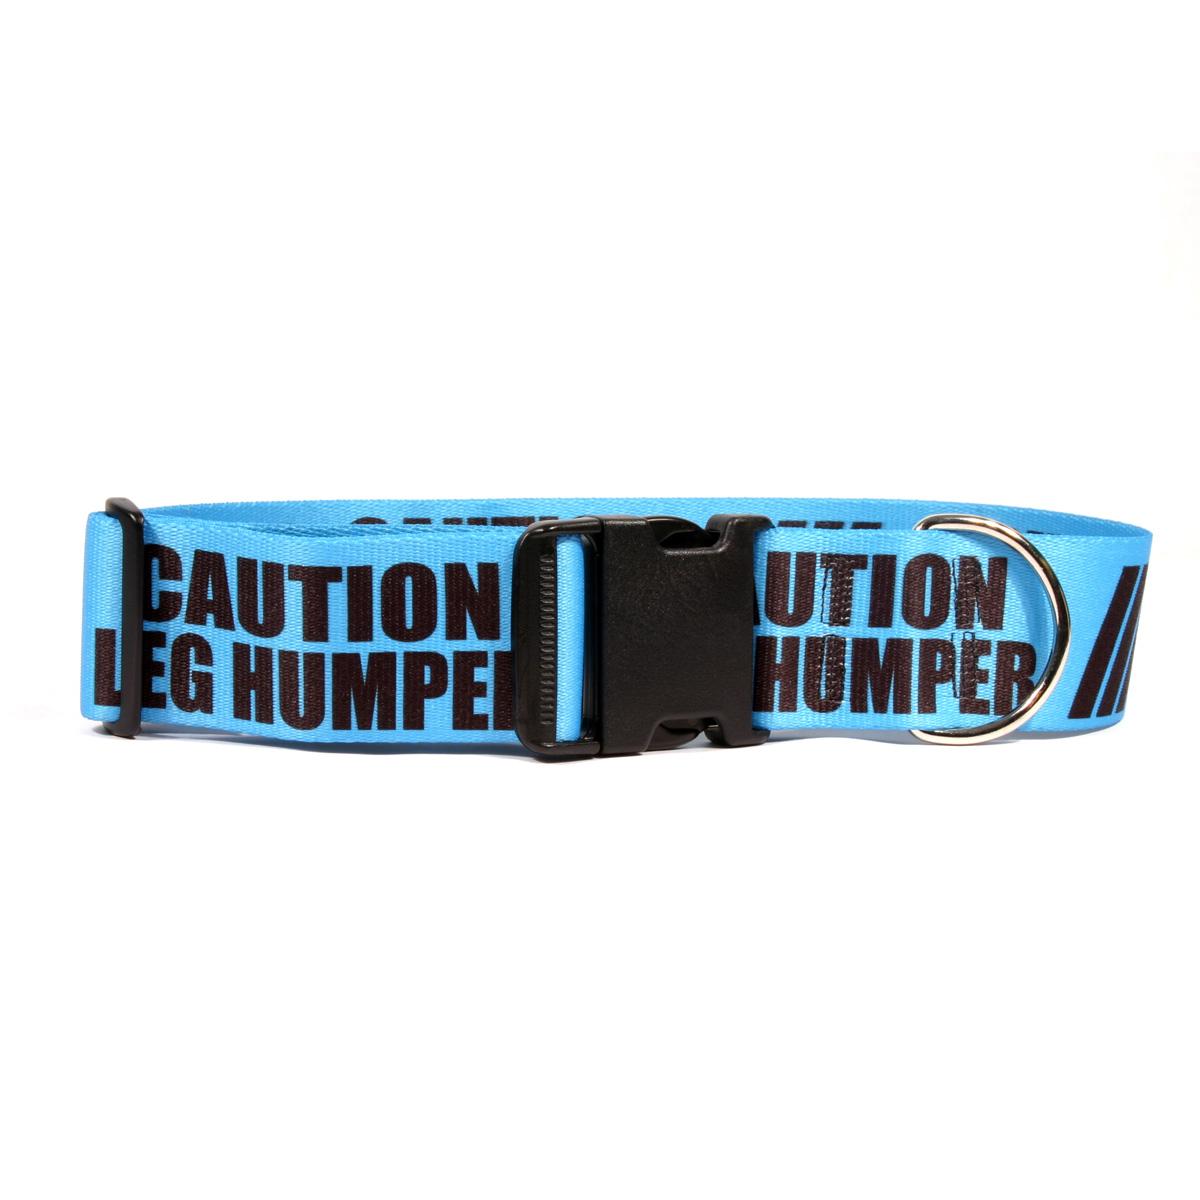 Yellow Dog 2 Inch - Caution Leg Humper Dog Collar